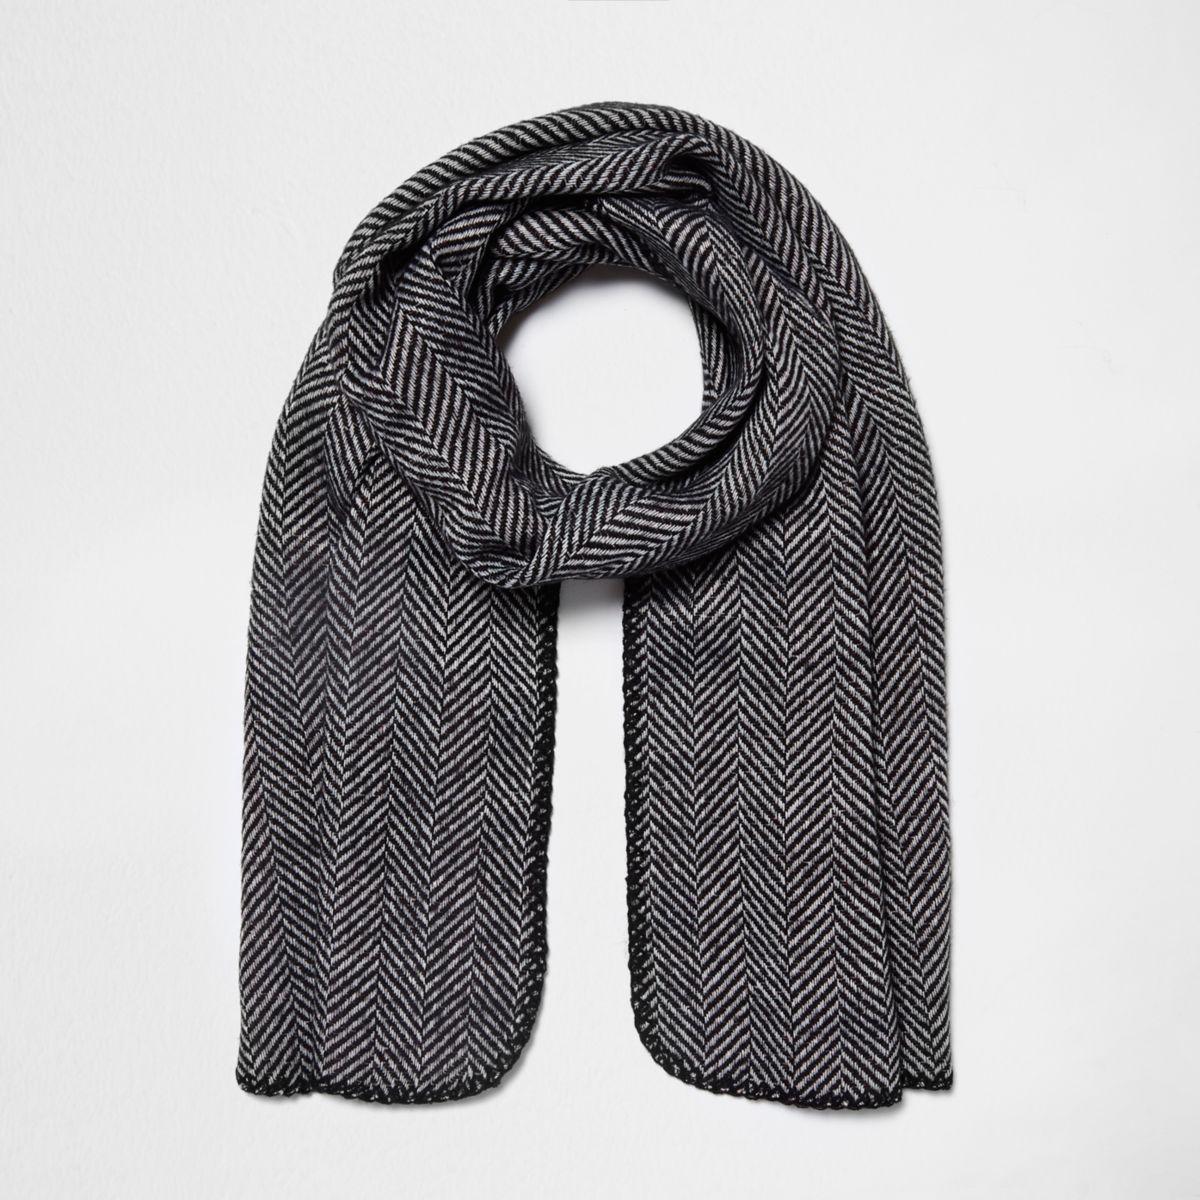 Black herringbone print reversible knit scarf